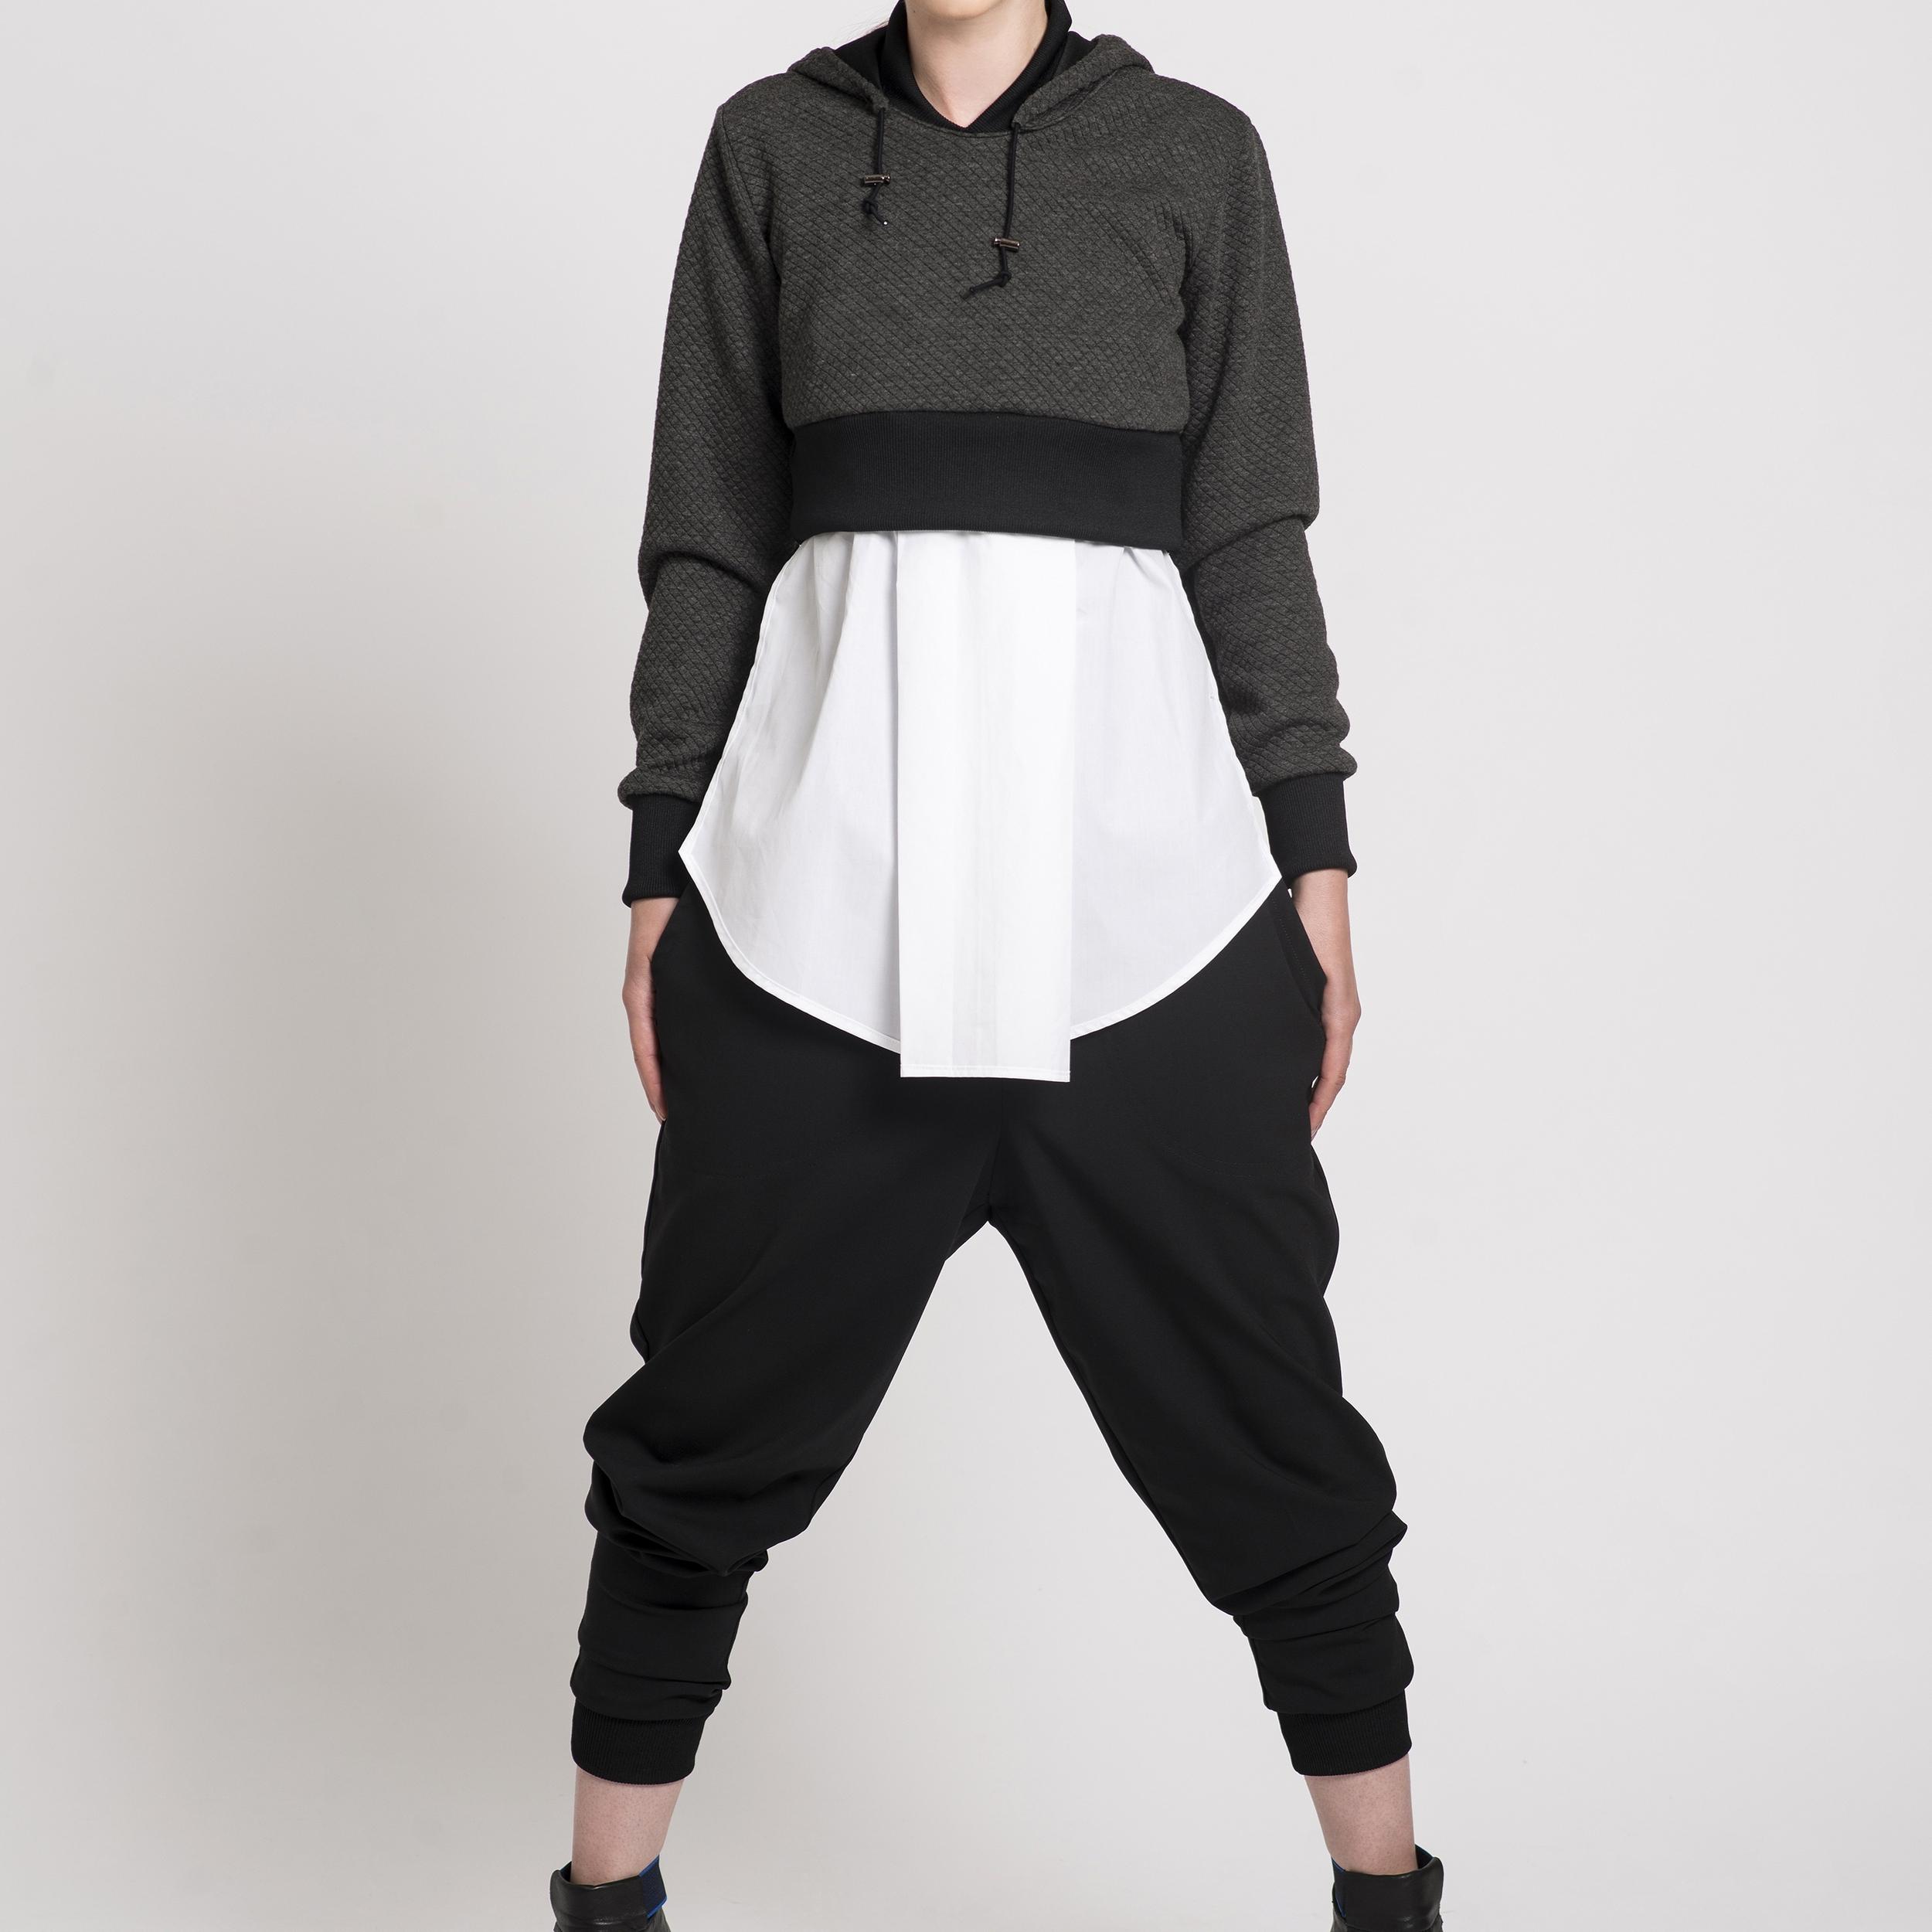 Sewing 4: Street Wear/ Designer Finishes